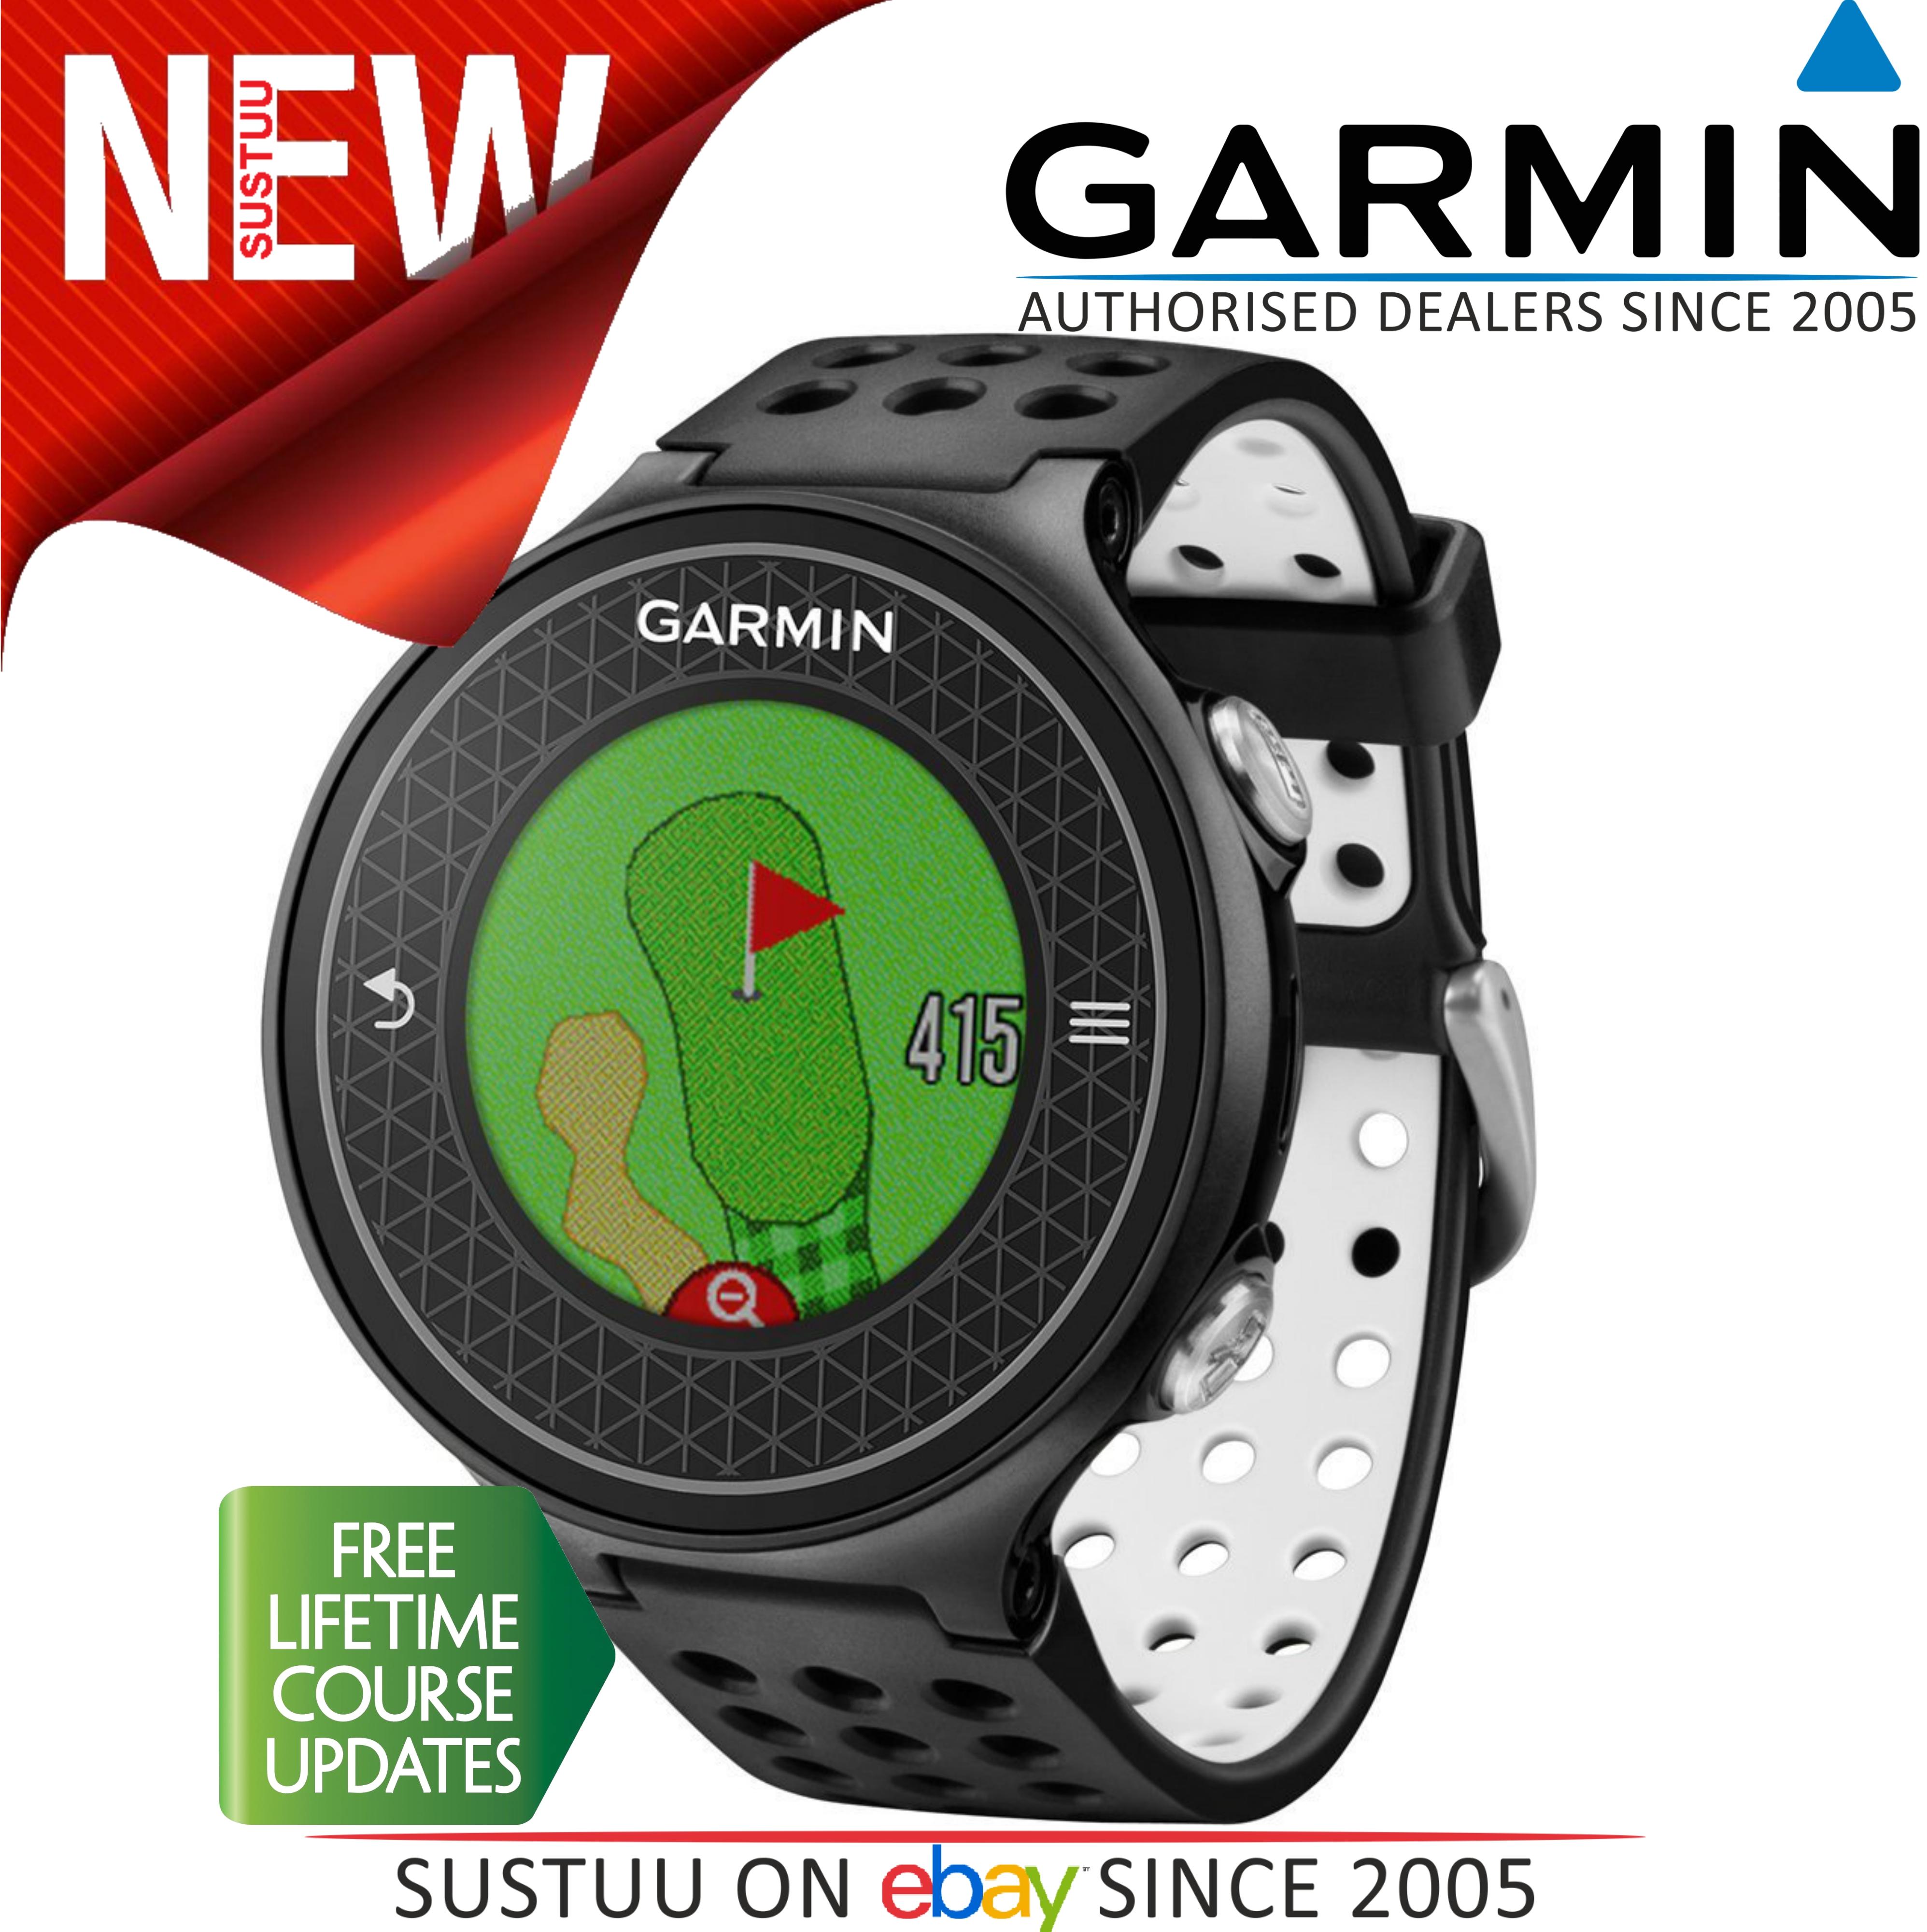 Garmin Approach S6|GPS Rangefinder Golf Watch|38000 Worldwide Golf Courses|Black